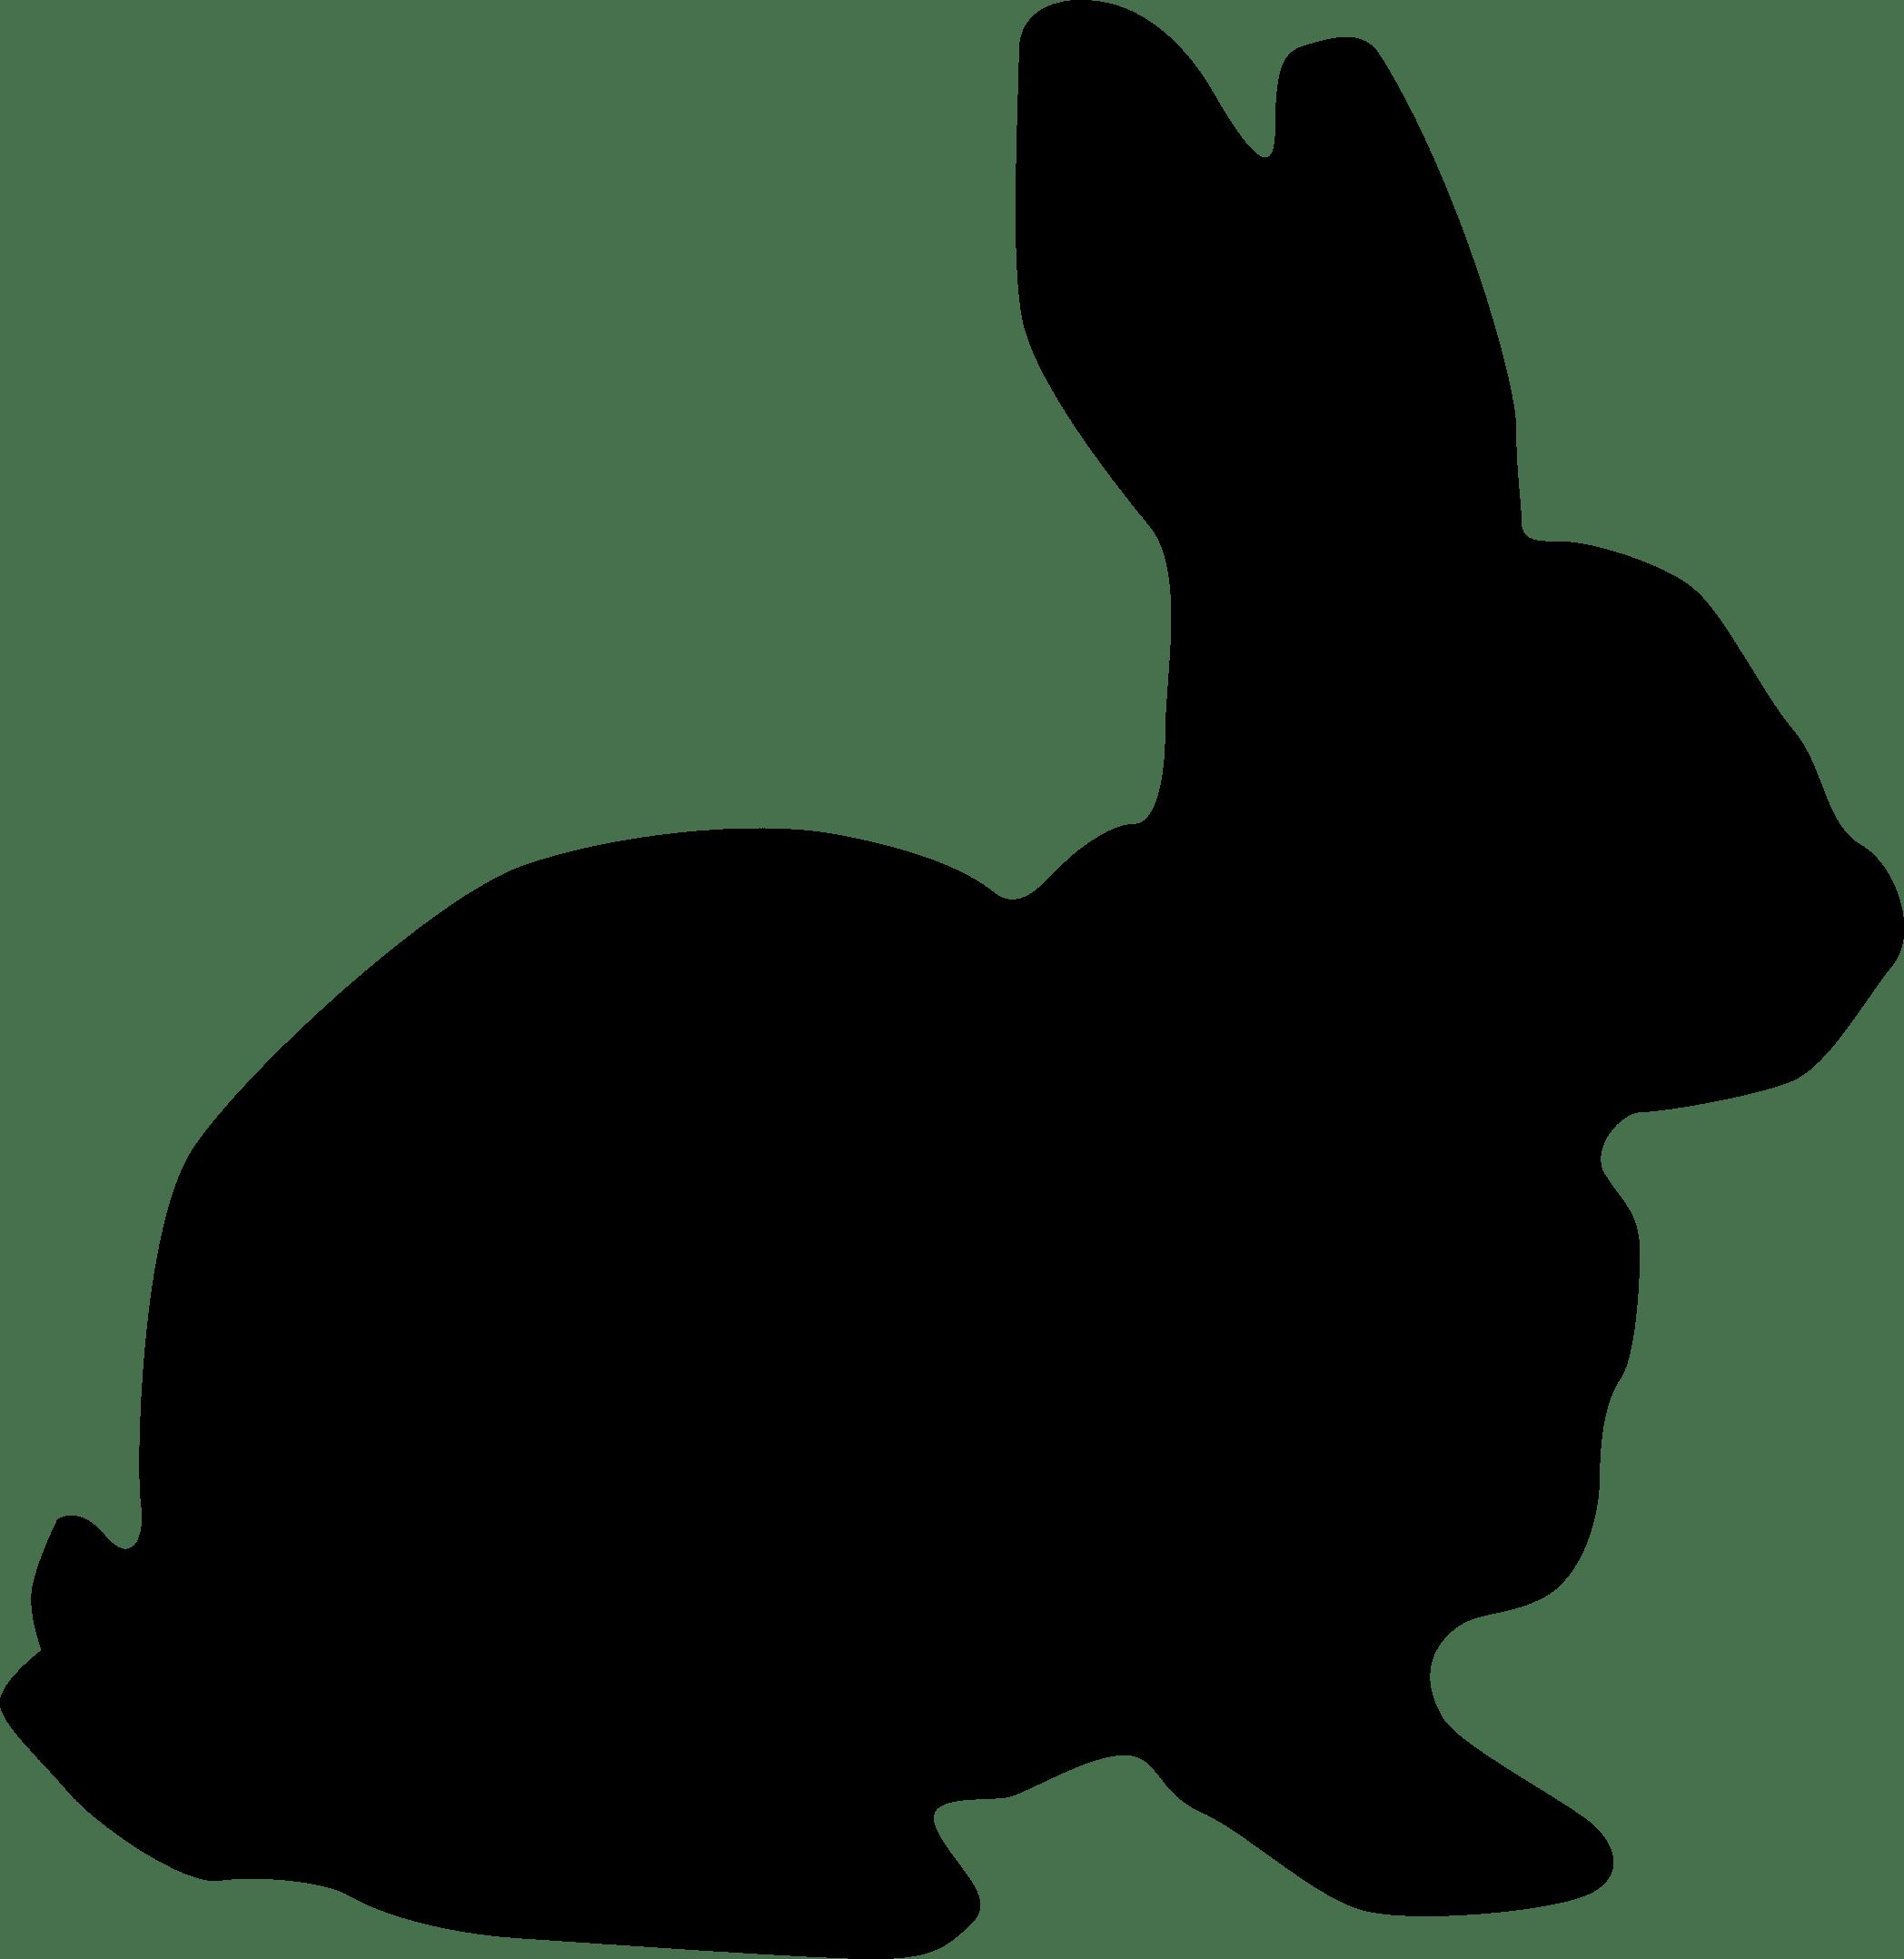 Rabbit Silhouette Transparent PNG Image #225.